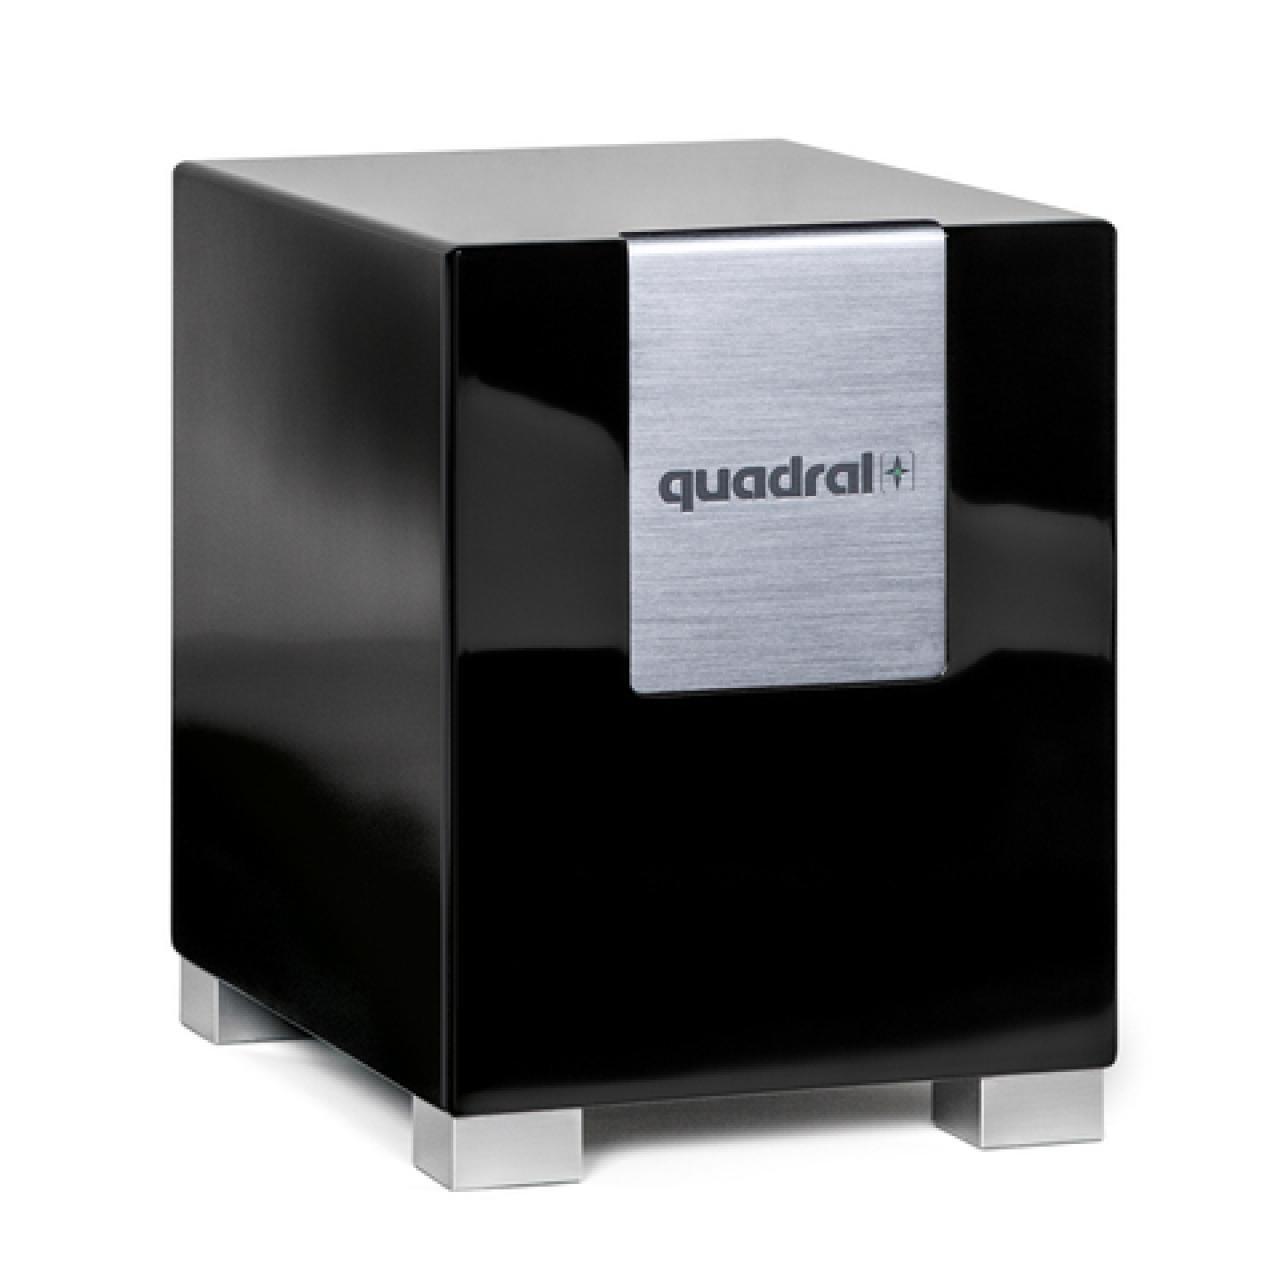 Quadral Cube 8 Subwoofer